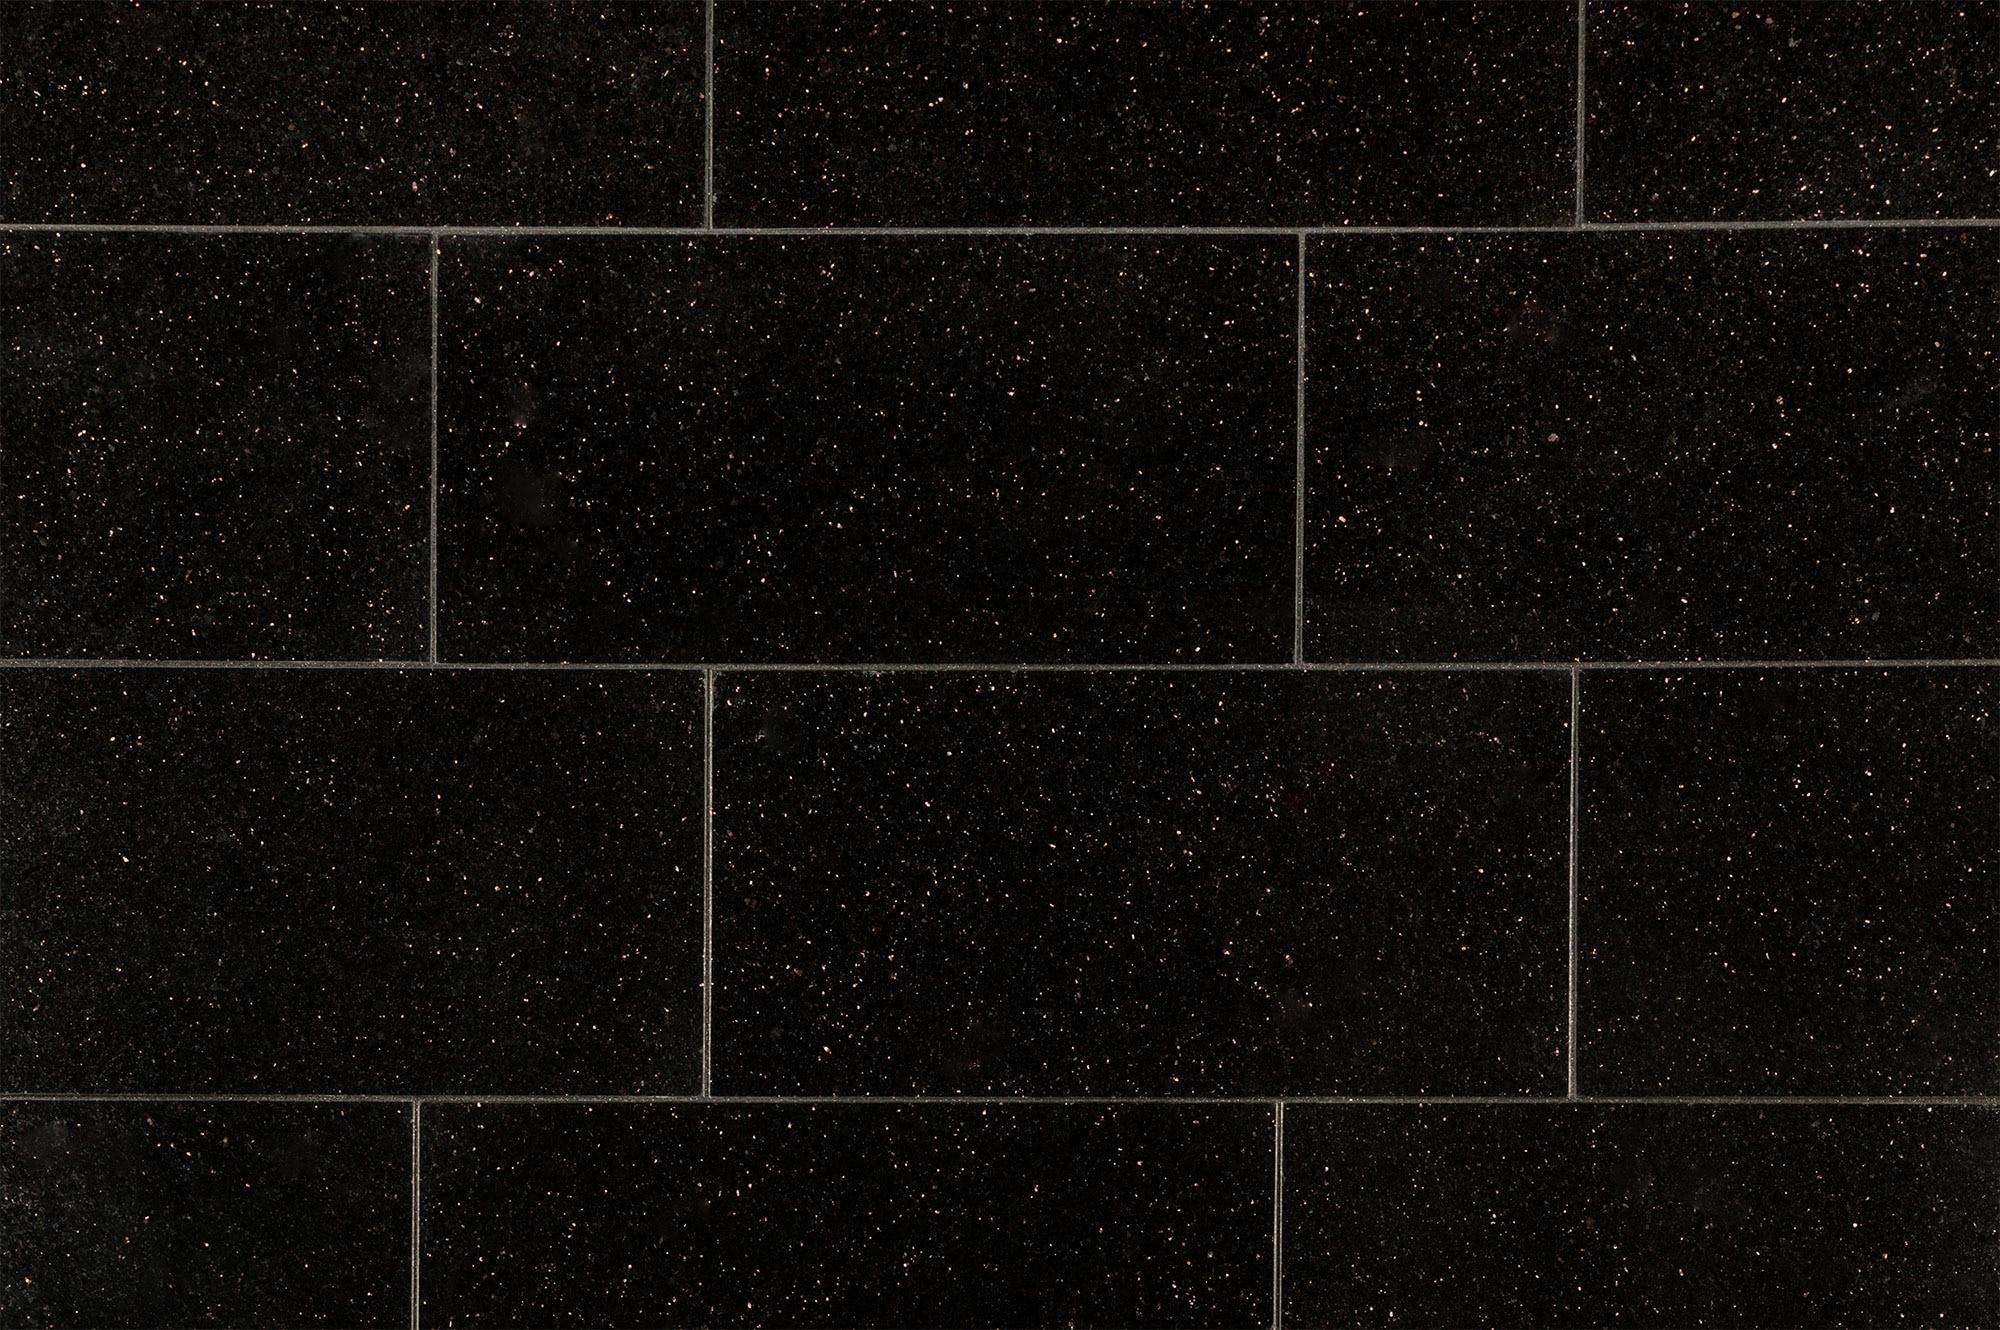 Agra granite tile pallavas collection black galaxy 12x24x38 agra granite tile pallavas collection black galaxy 12x24x38 polished dailygadgetfo Choice Image